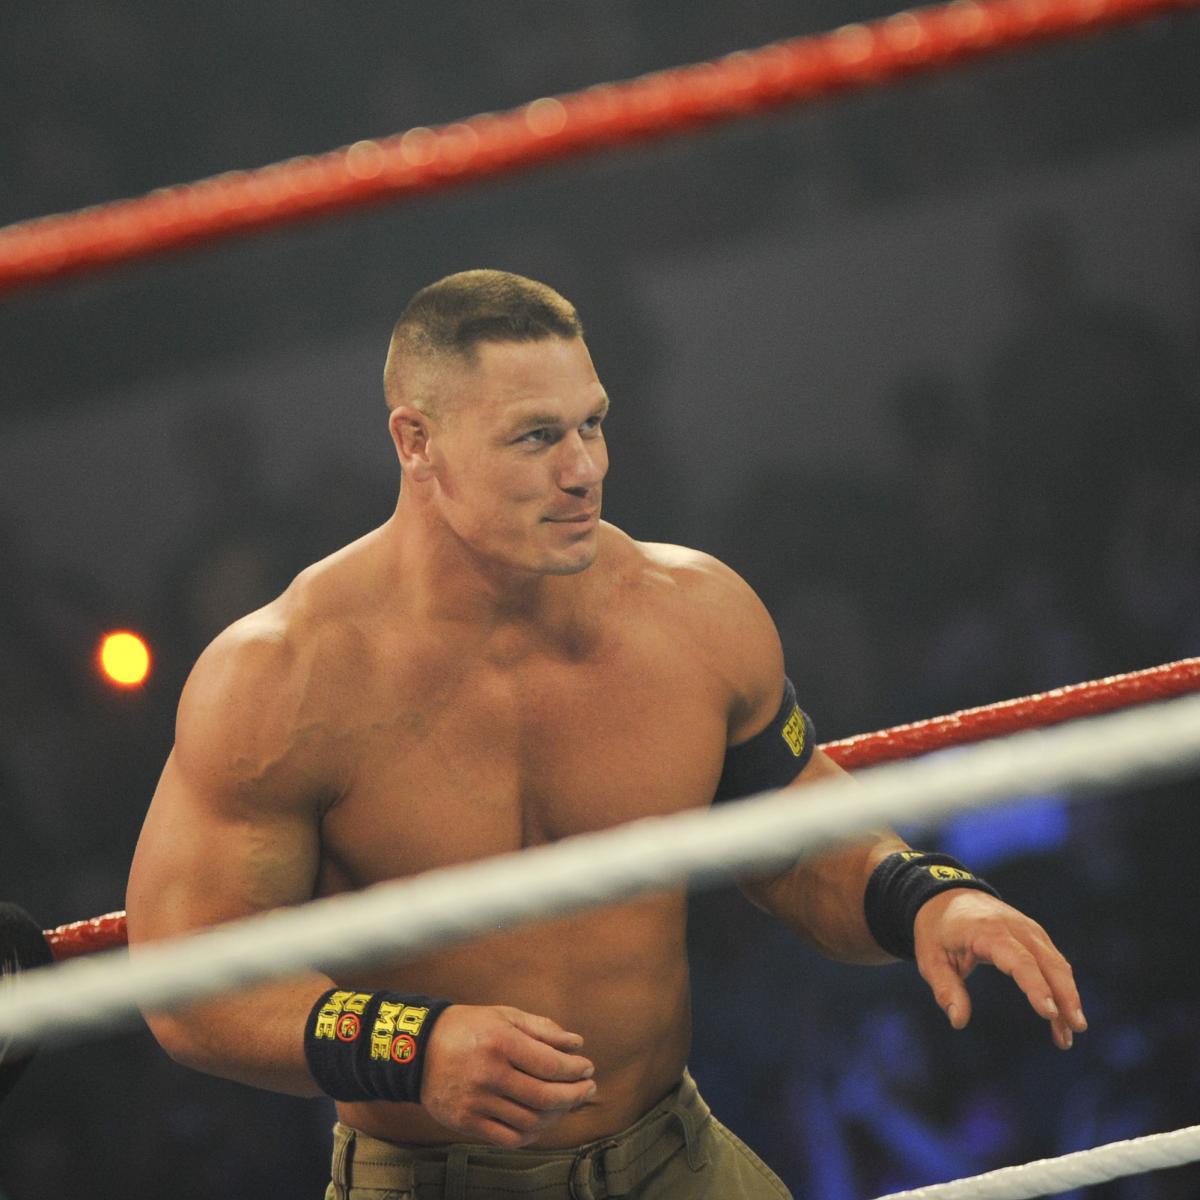 John Cena's Injury A Symptom Of WWE Overworking Its